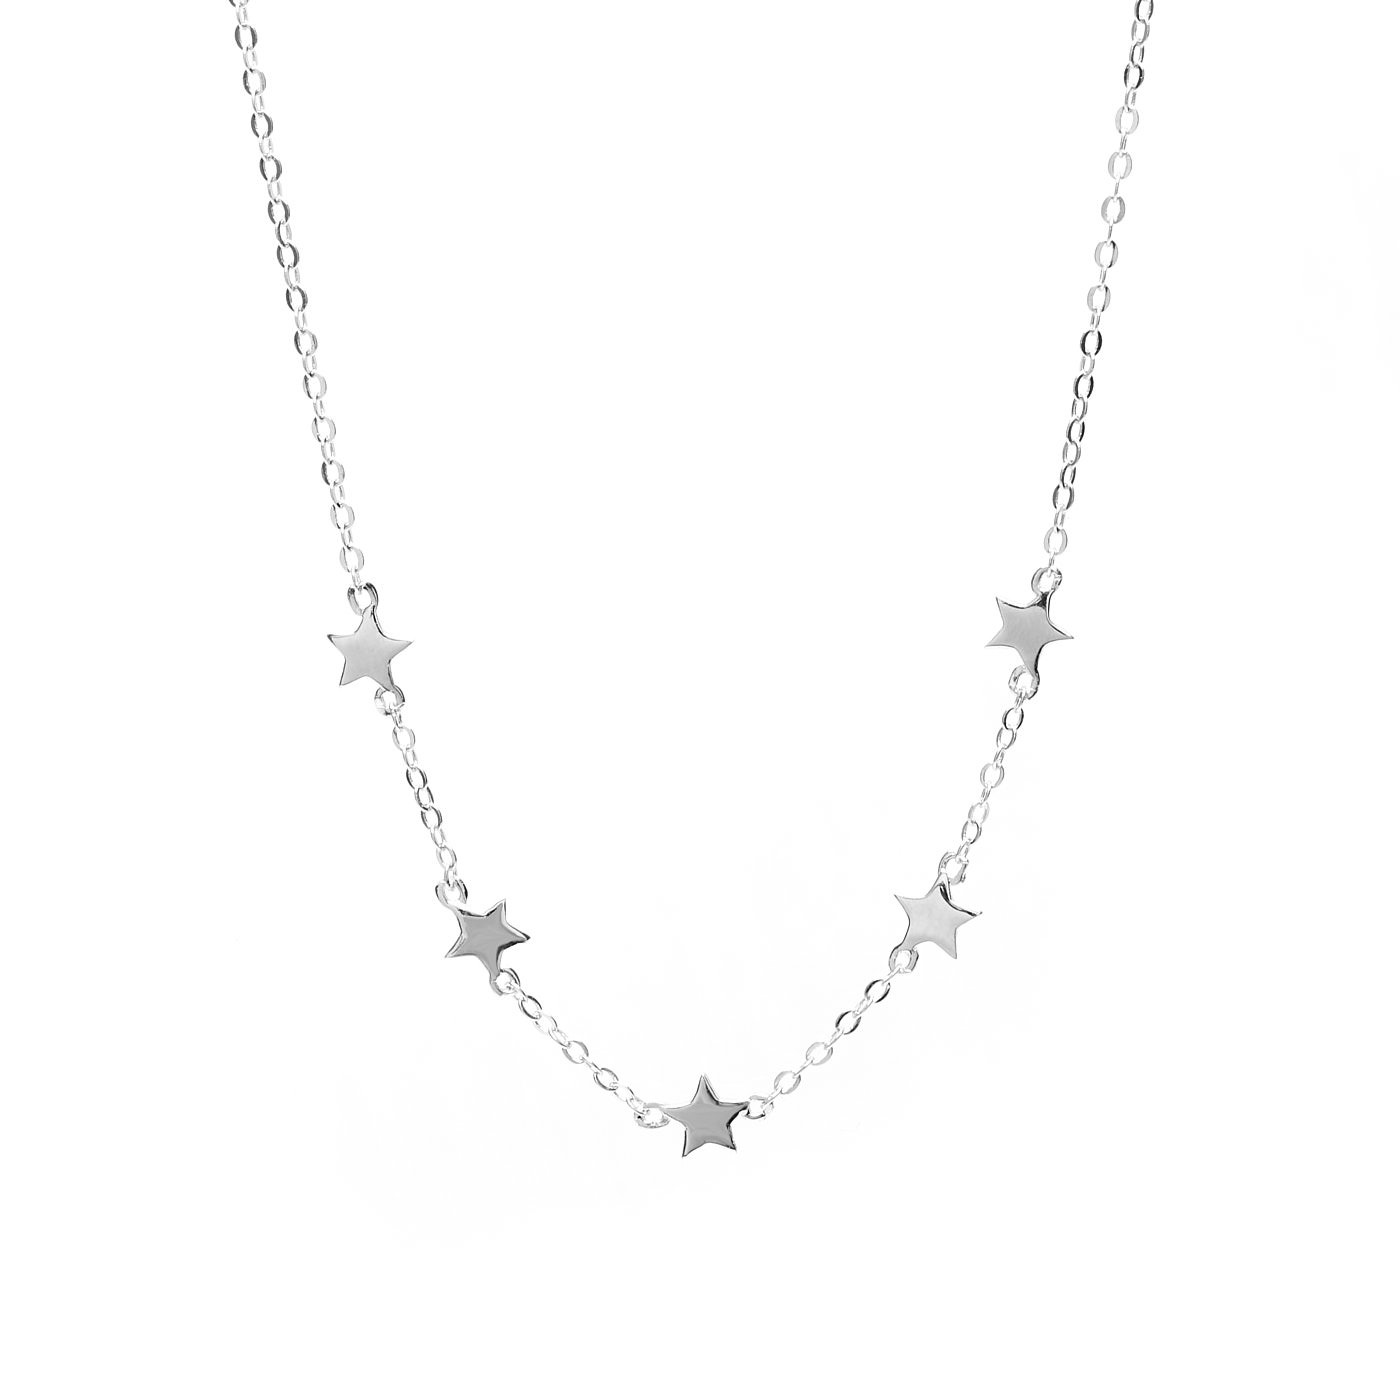 Violet Hamden collana in argento del valore di €59,95